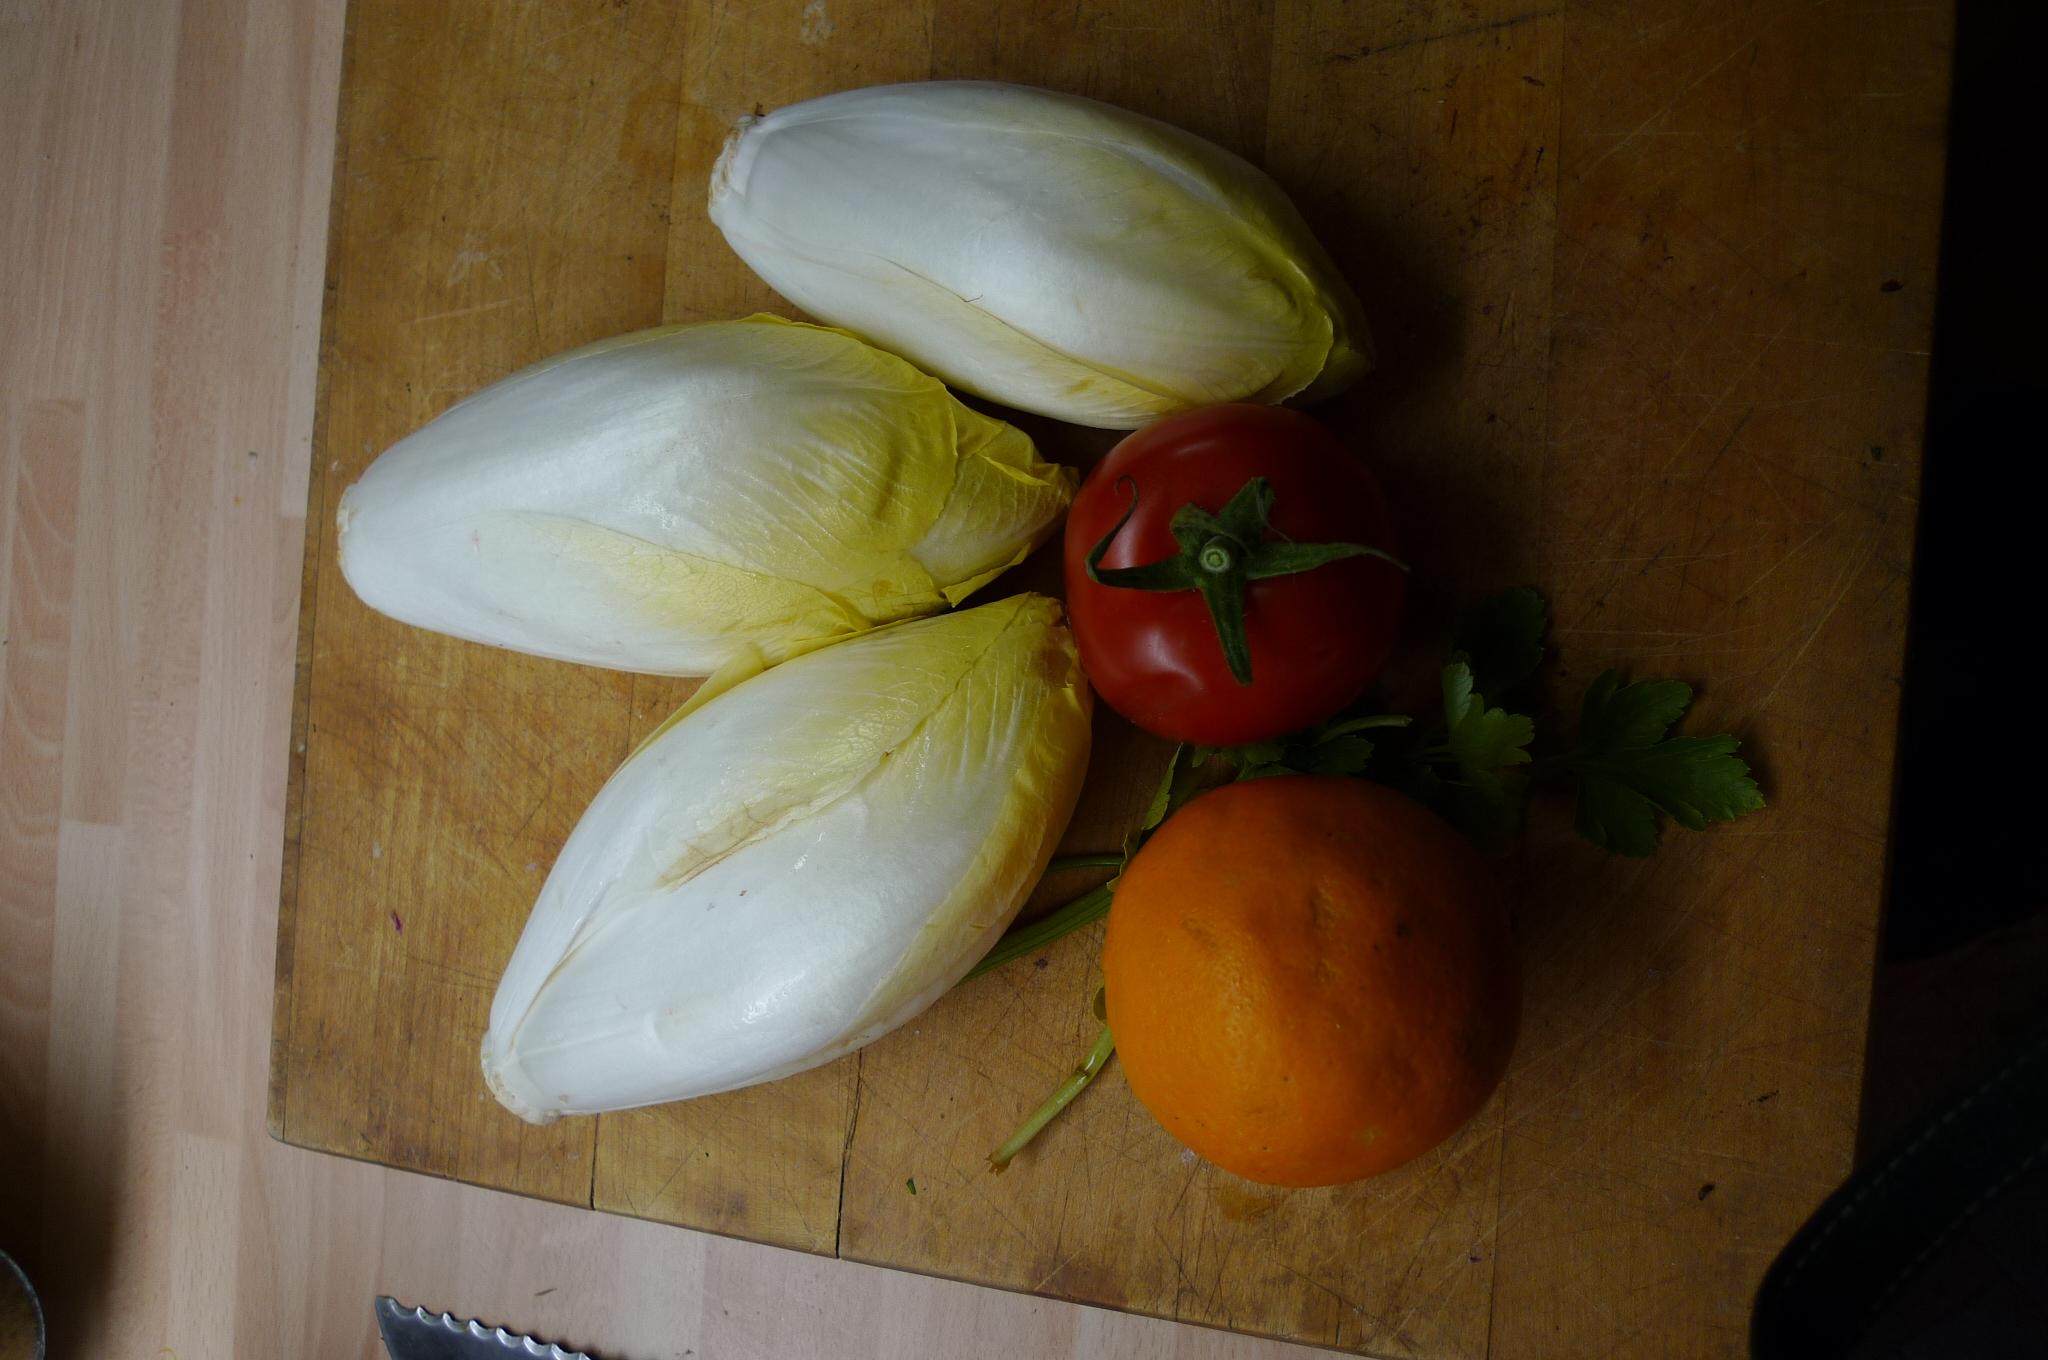 Kabeljau,Chicoreesalat,Kartoffeln,Quarkspeise - 17.2.15   (3)